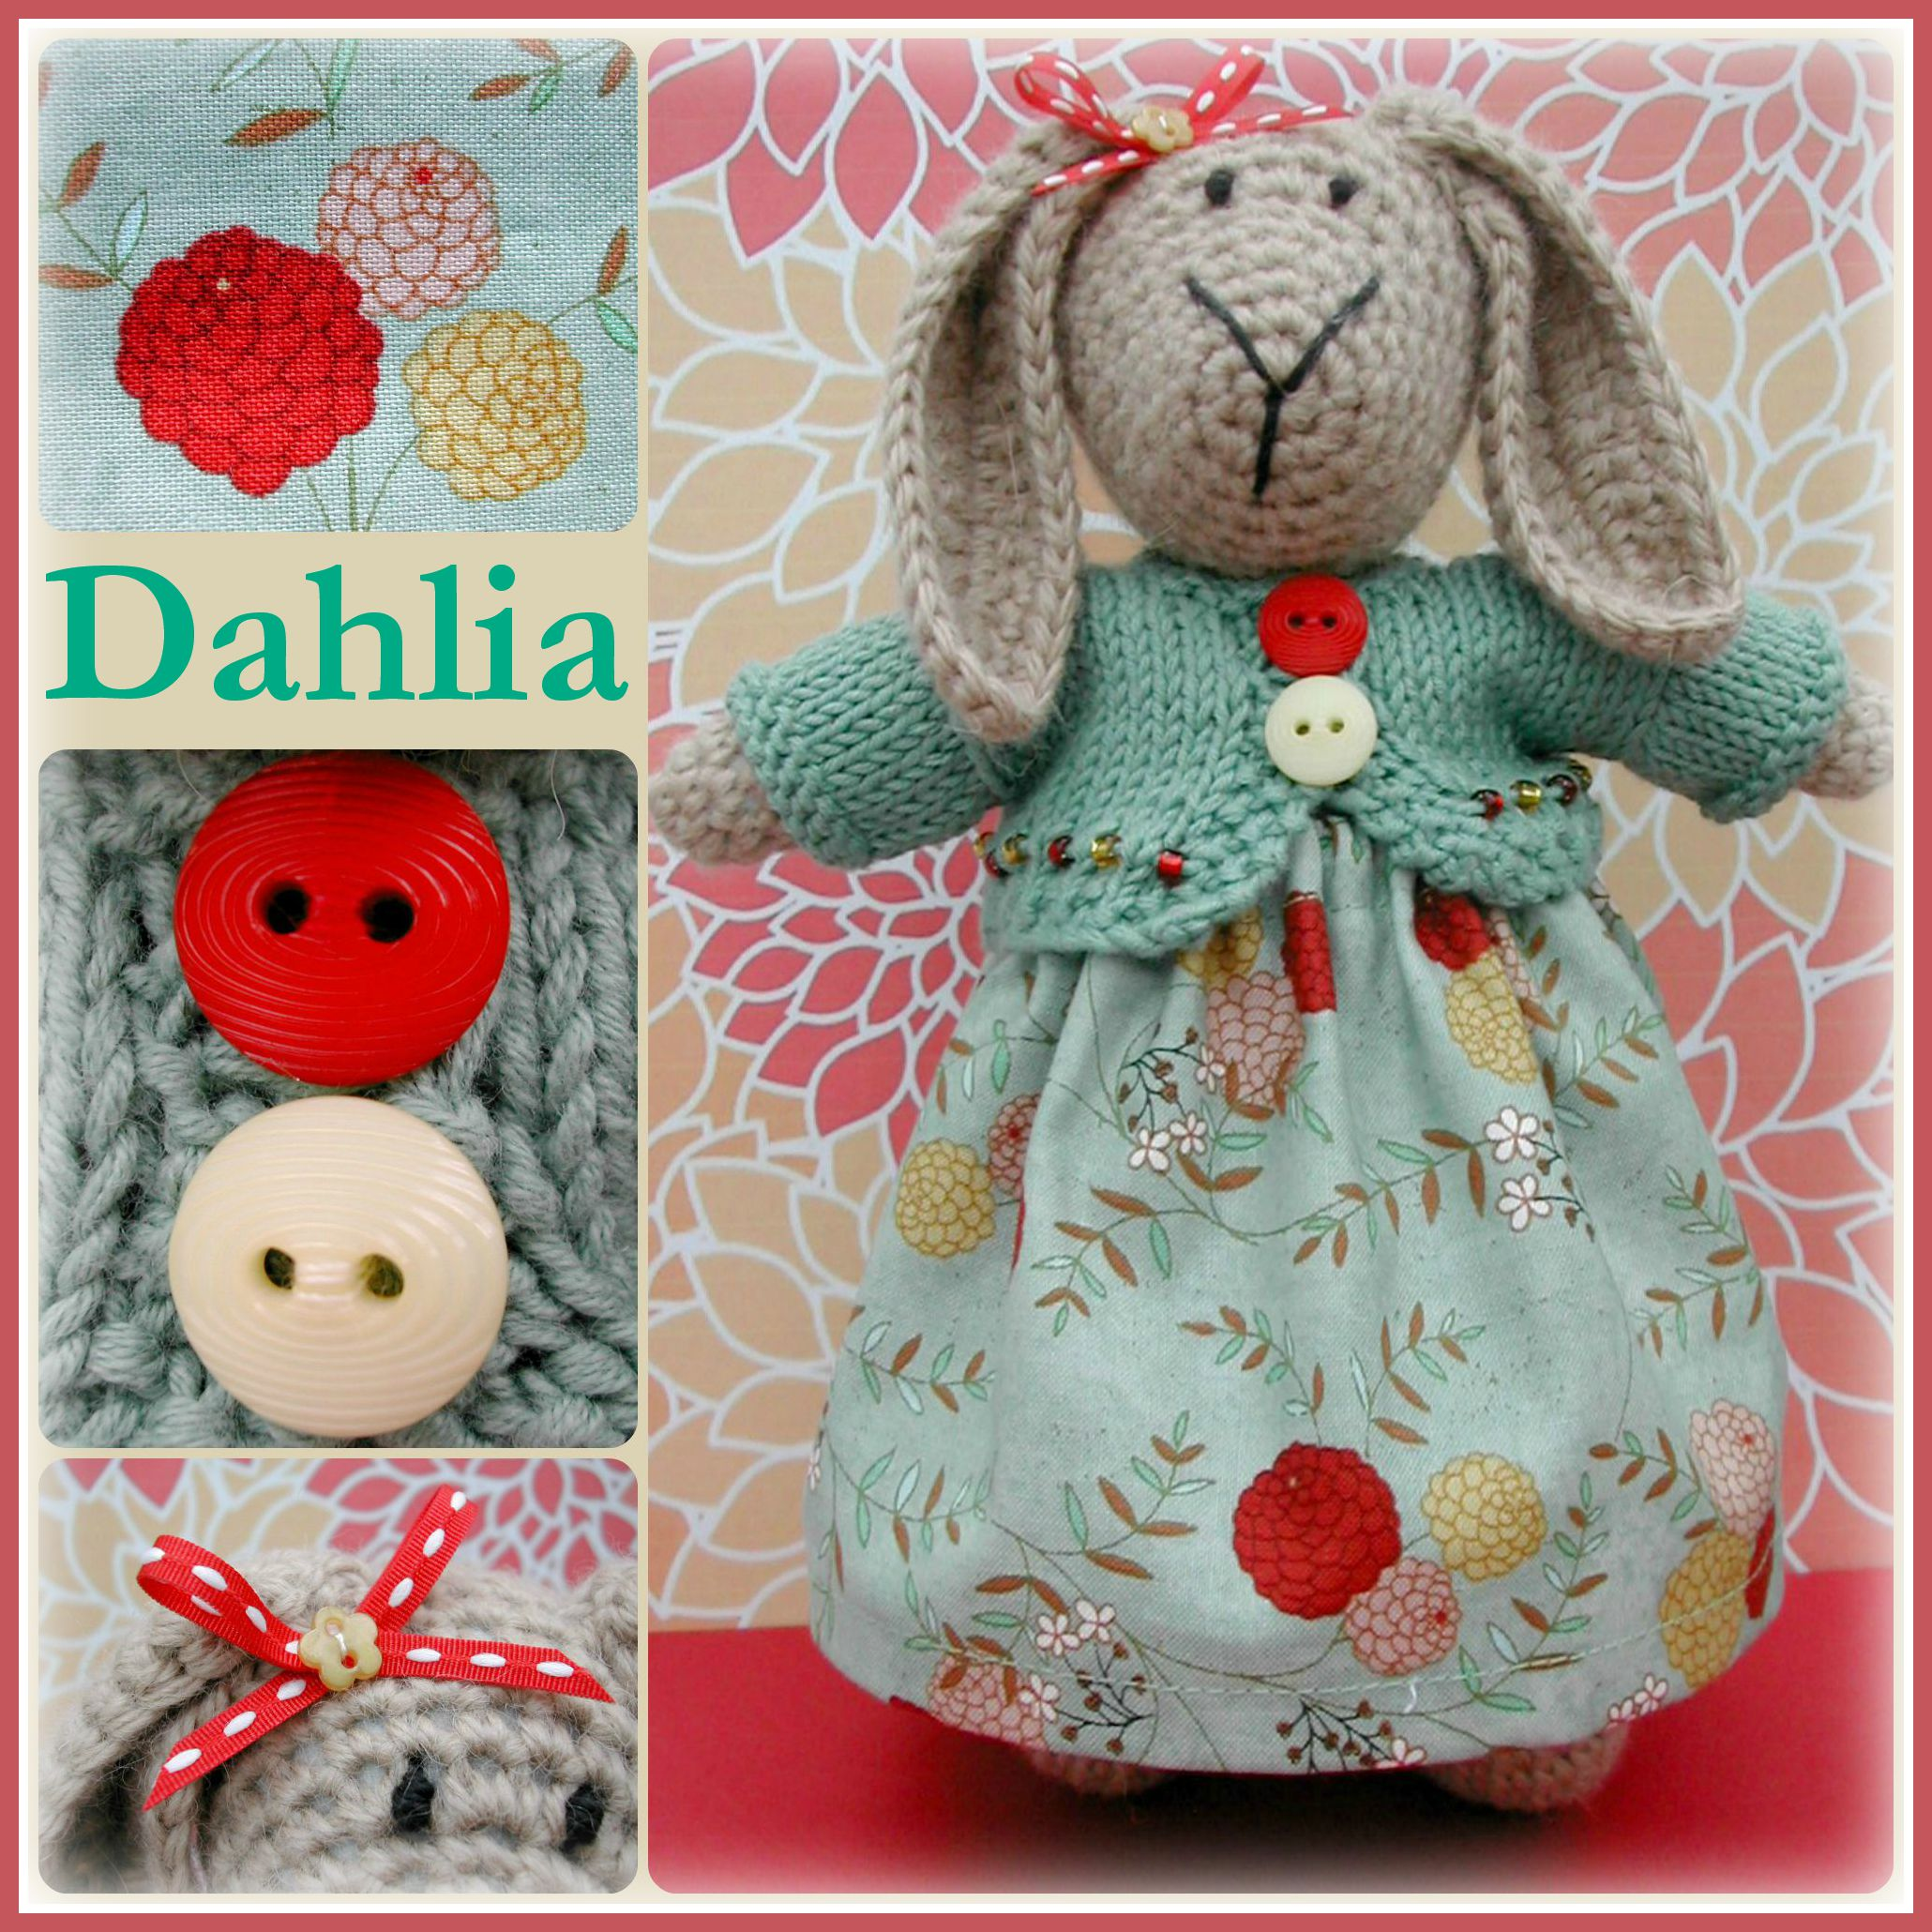 Dahlia Collage